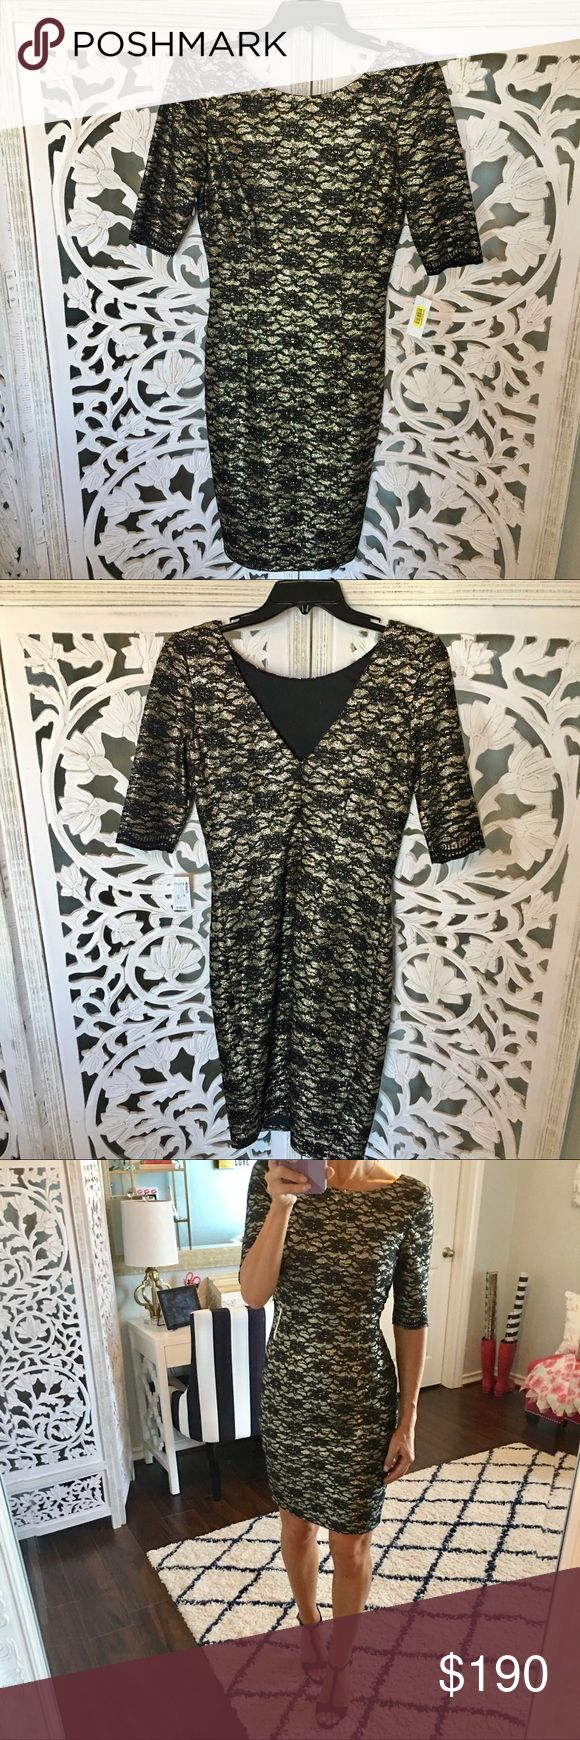 Eliza J Black and Metallic Gold Dress Brand new never worn! No trades, please💋 Eliza J Dresses